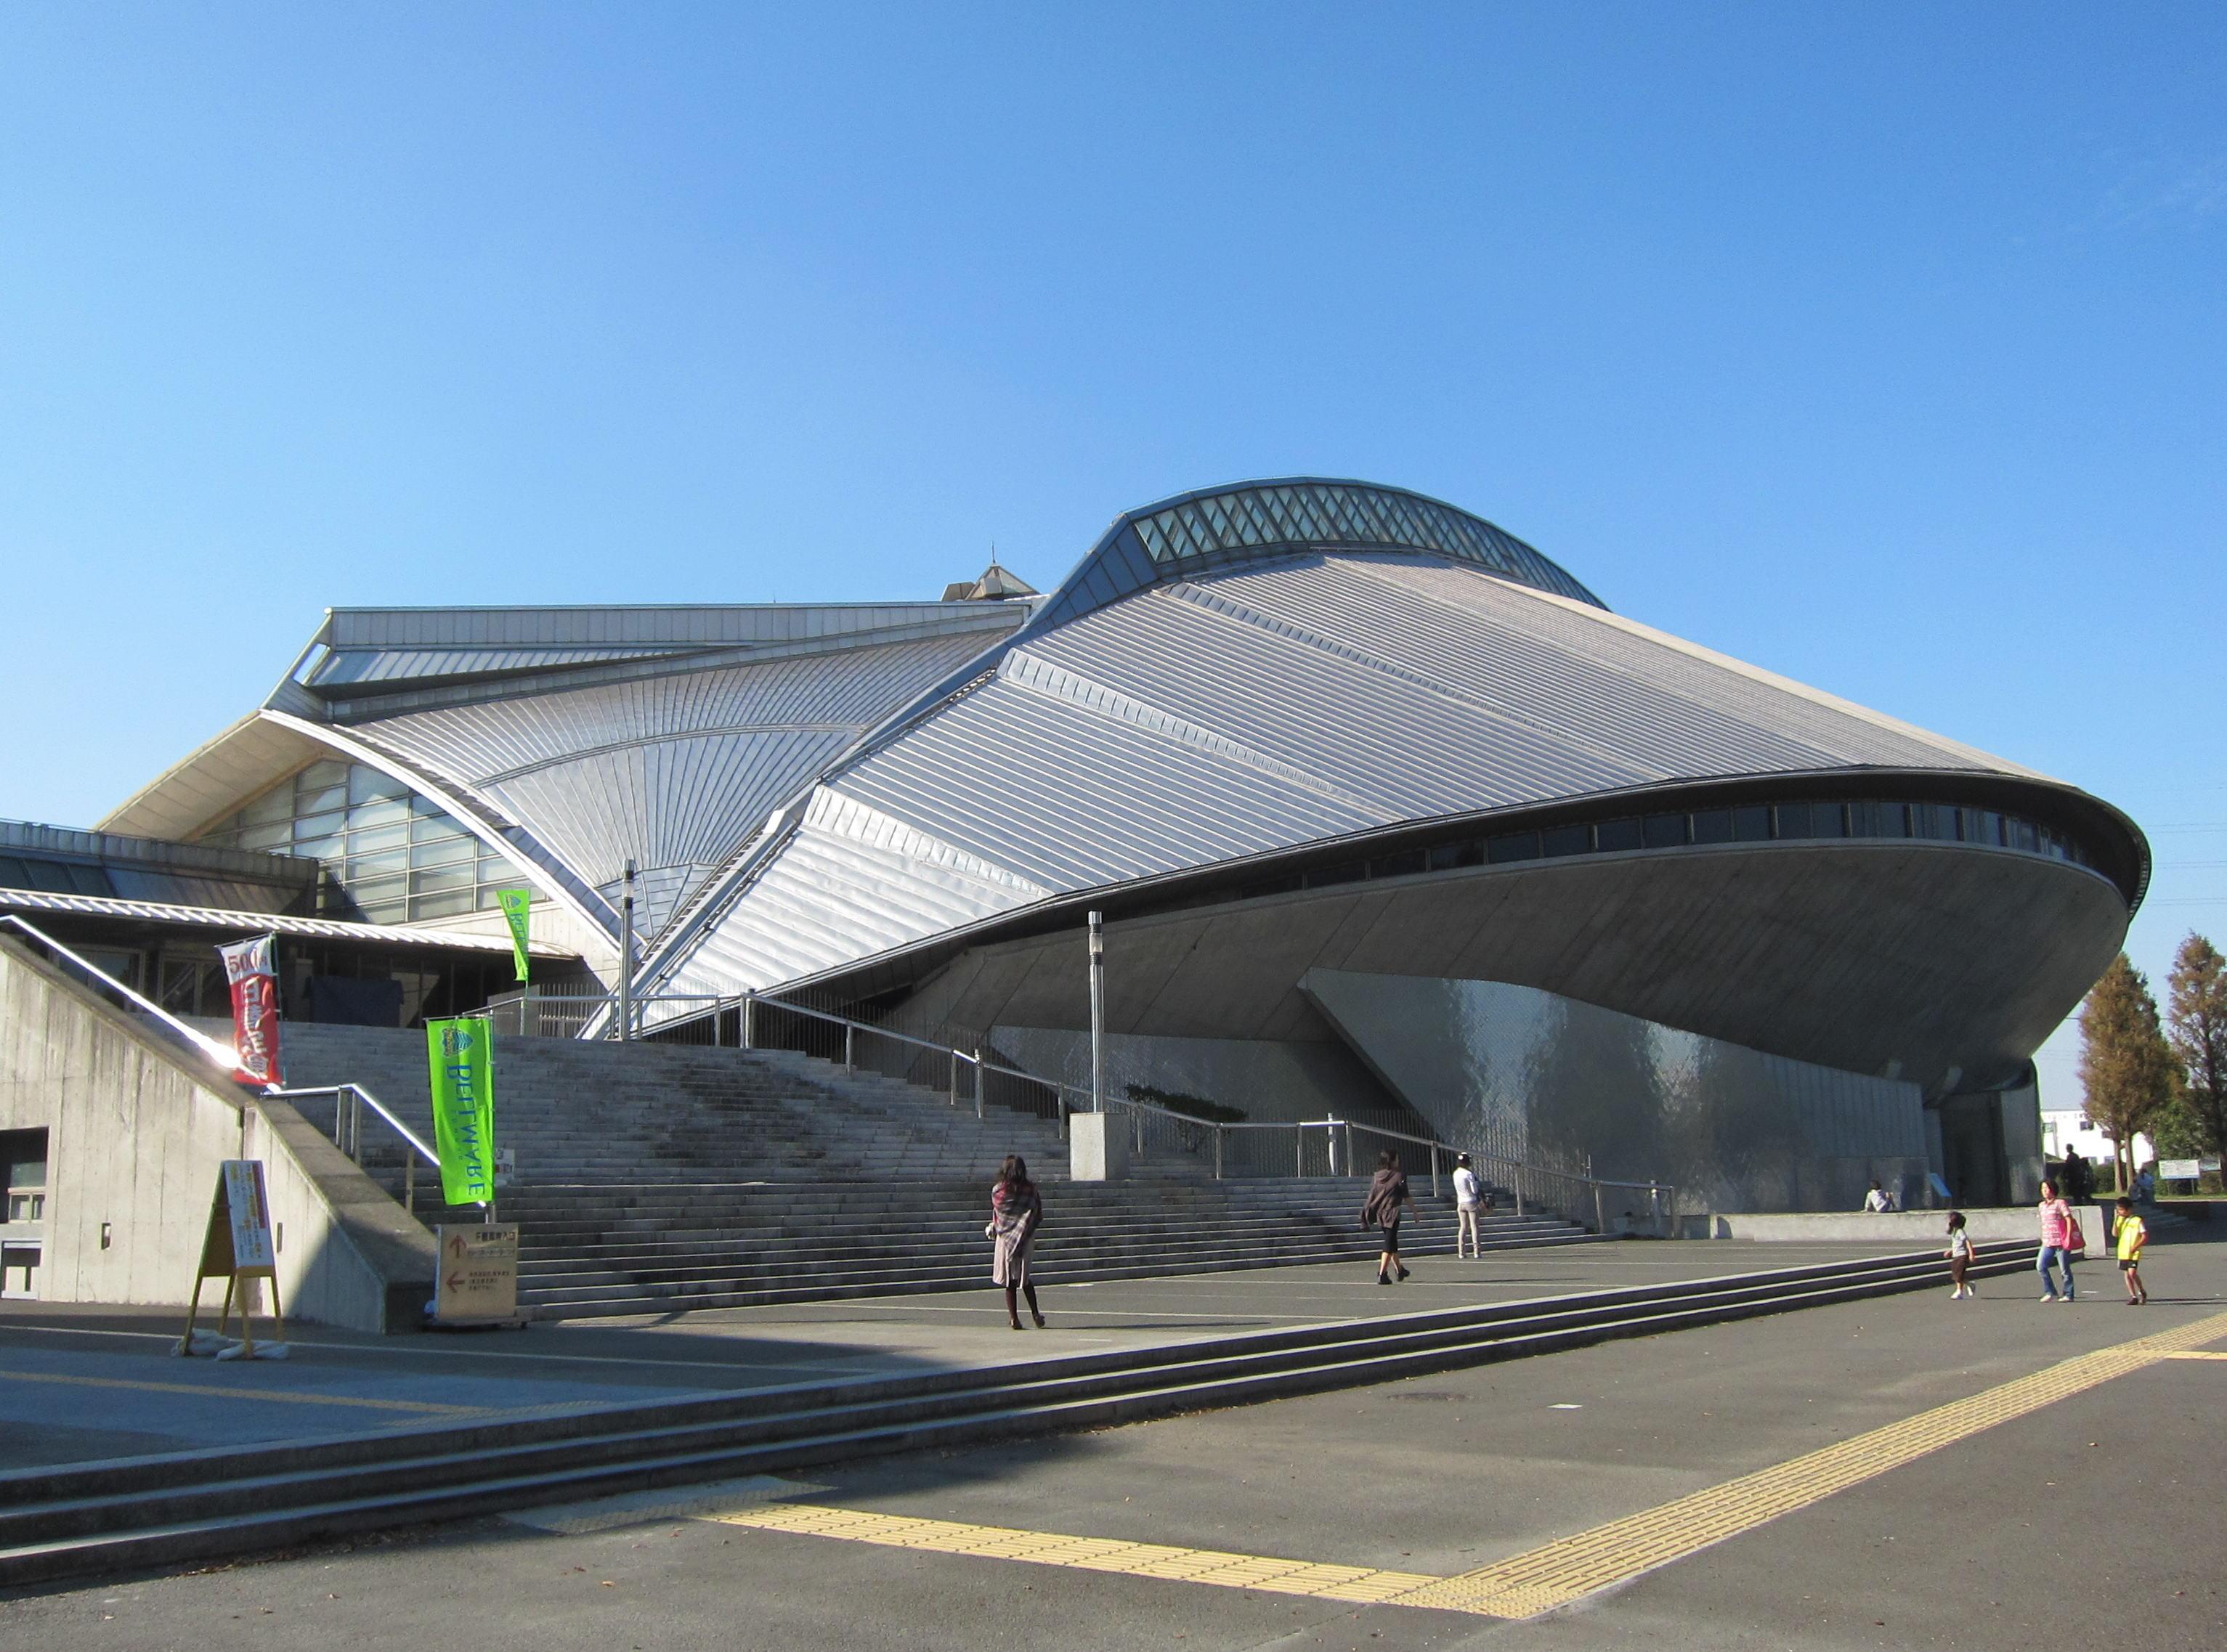 NAVER まとめ「ピンポン」の舞台探訪【江の島・湘南】